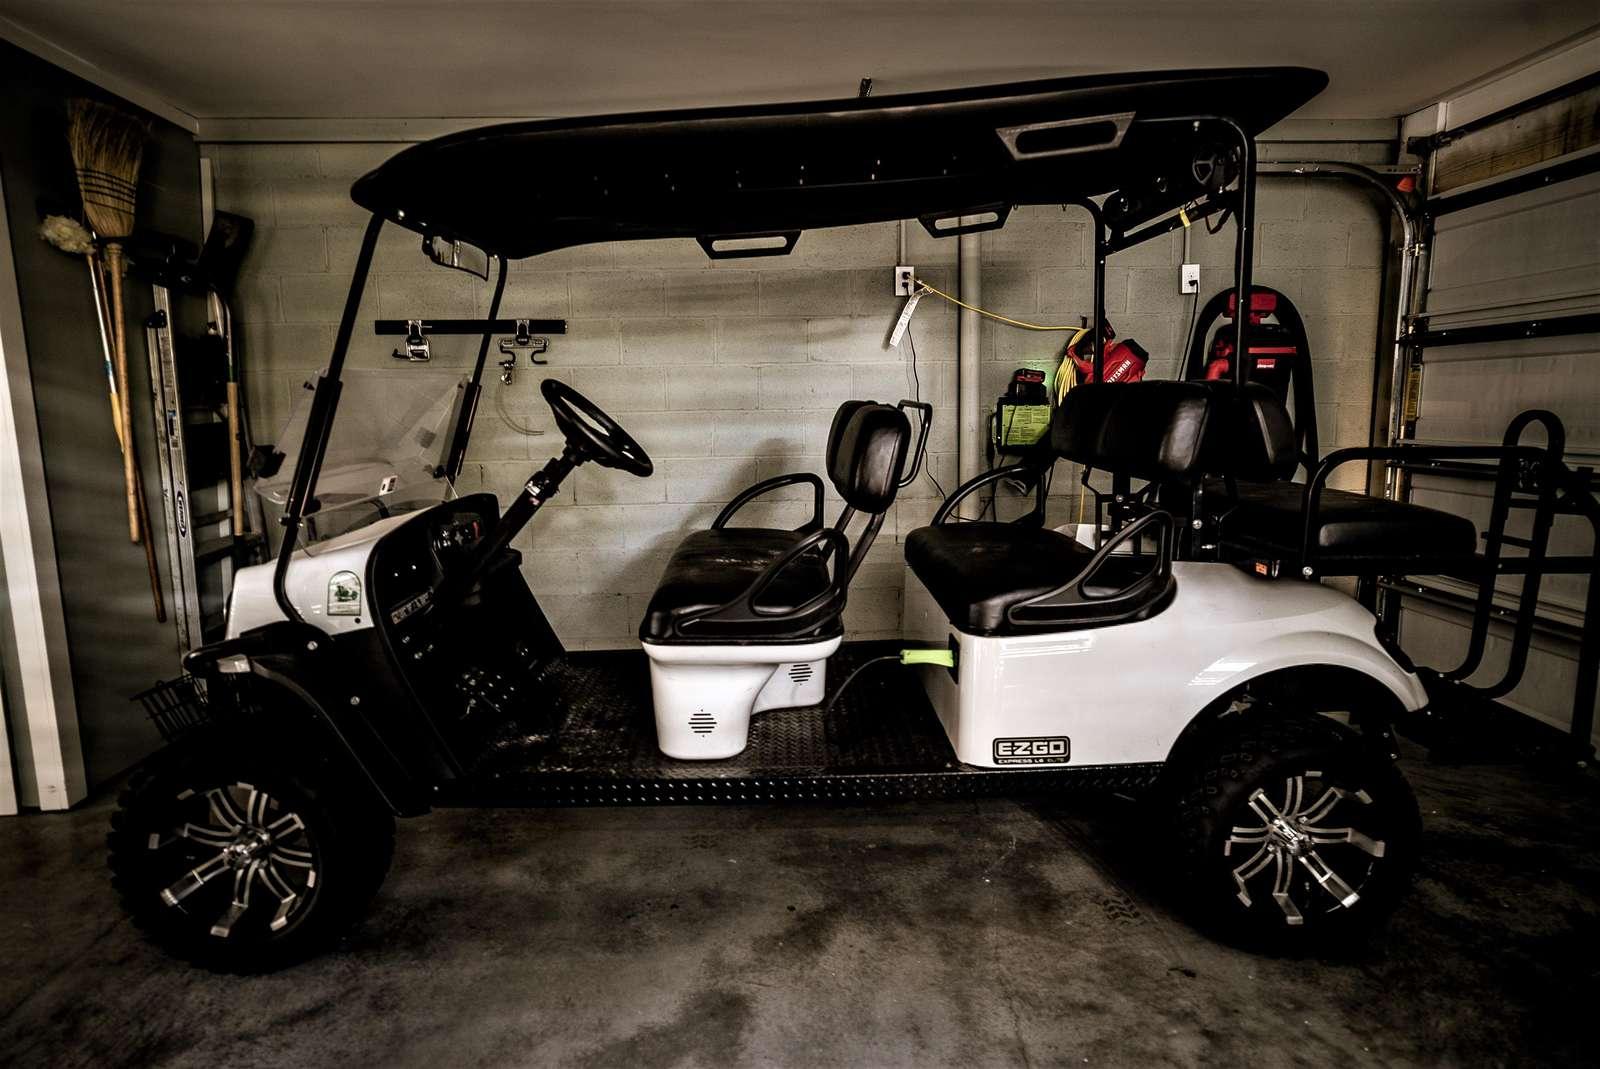 6 Passenger Golf Cart for Rent